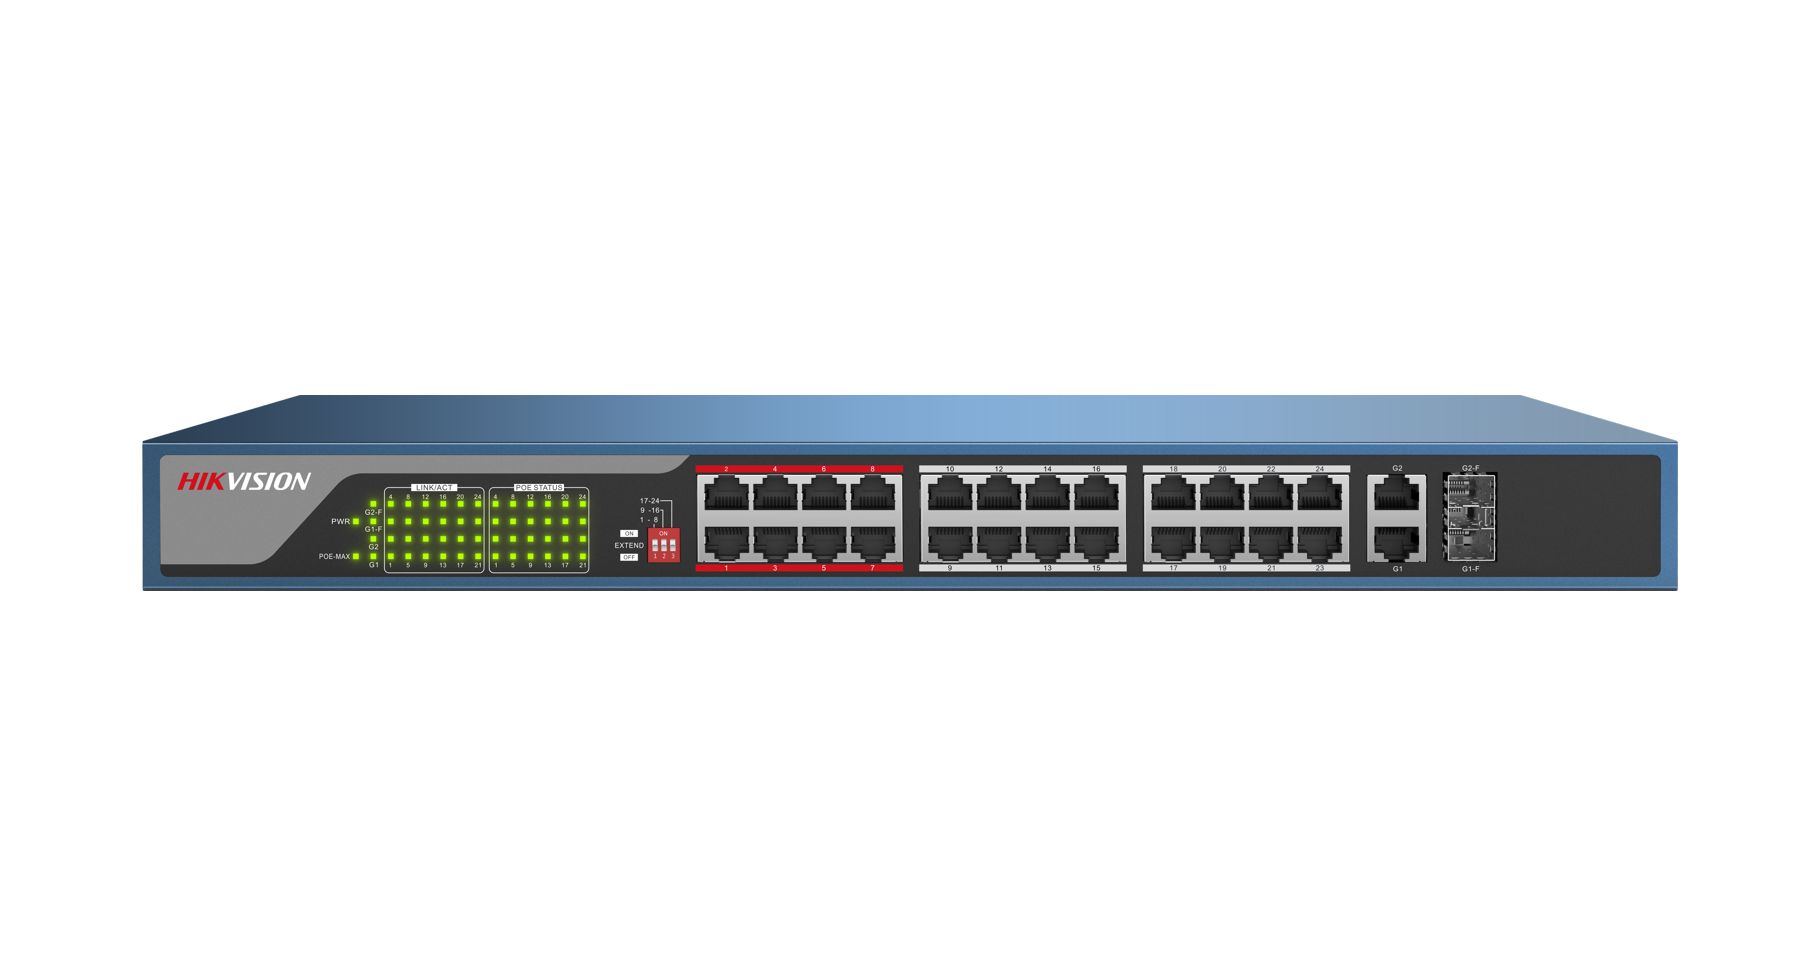 Switch 24P POE 10/100MBPS 30W DS-3E0326P-E Hikvision